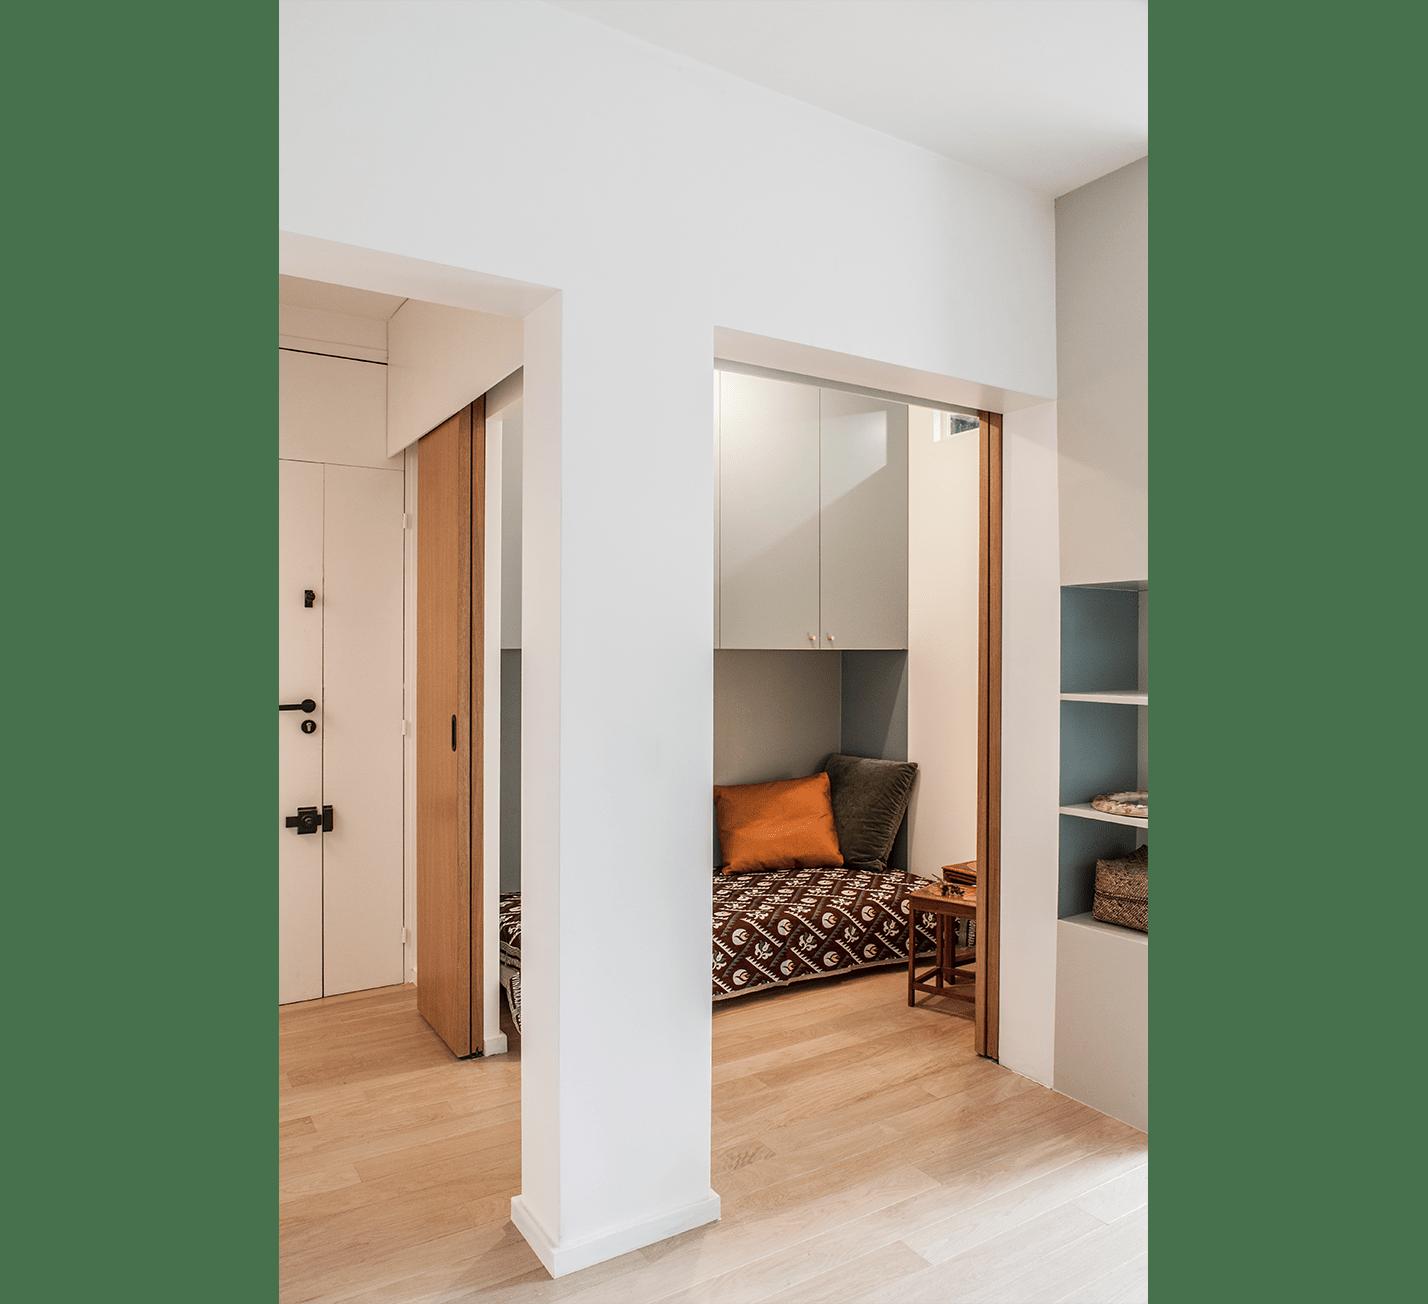 Projet-Albert-Atelier-Steve-Pauline-Borgia-Architecte-interieur-10-min-1